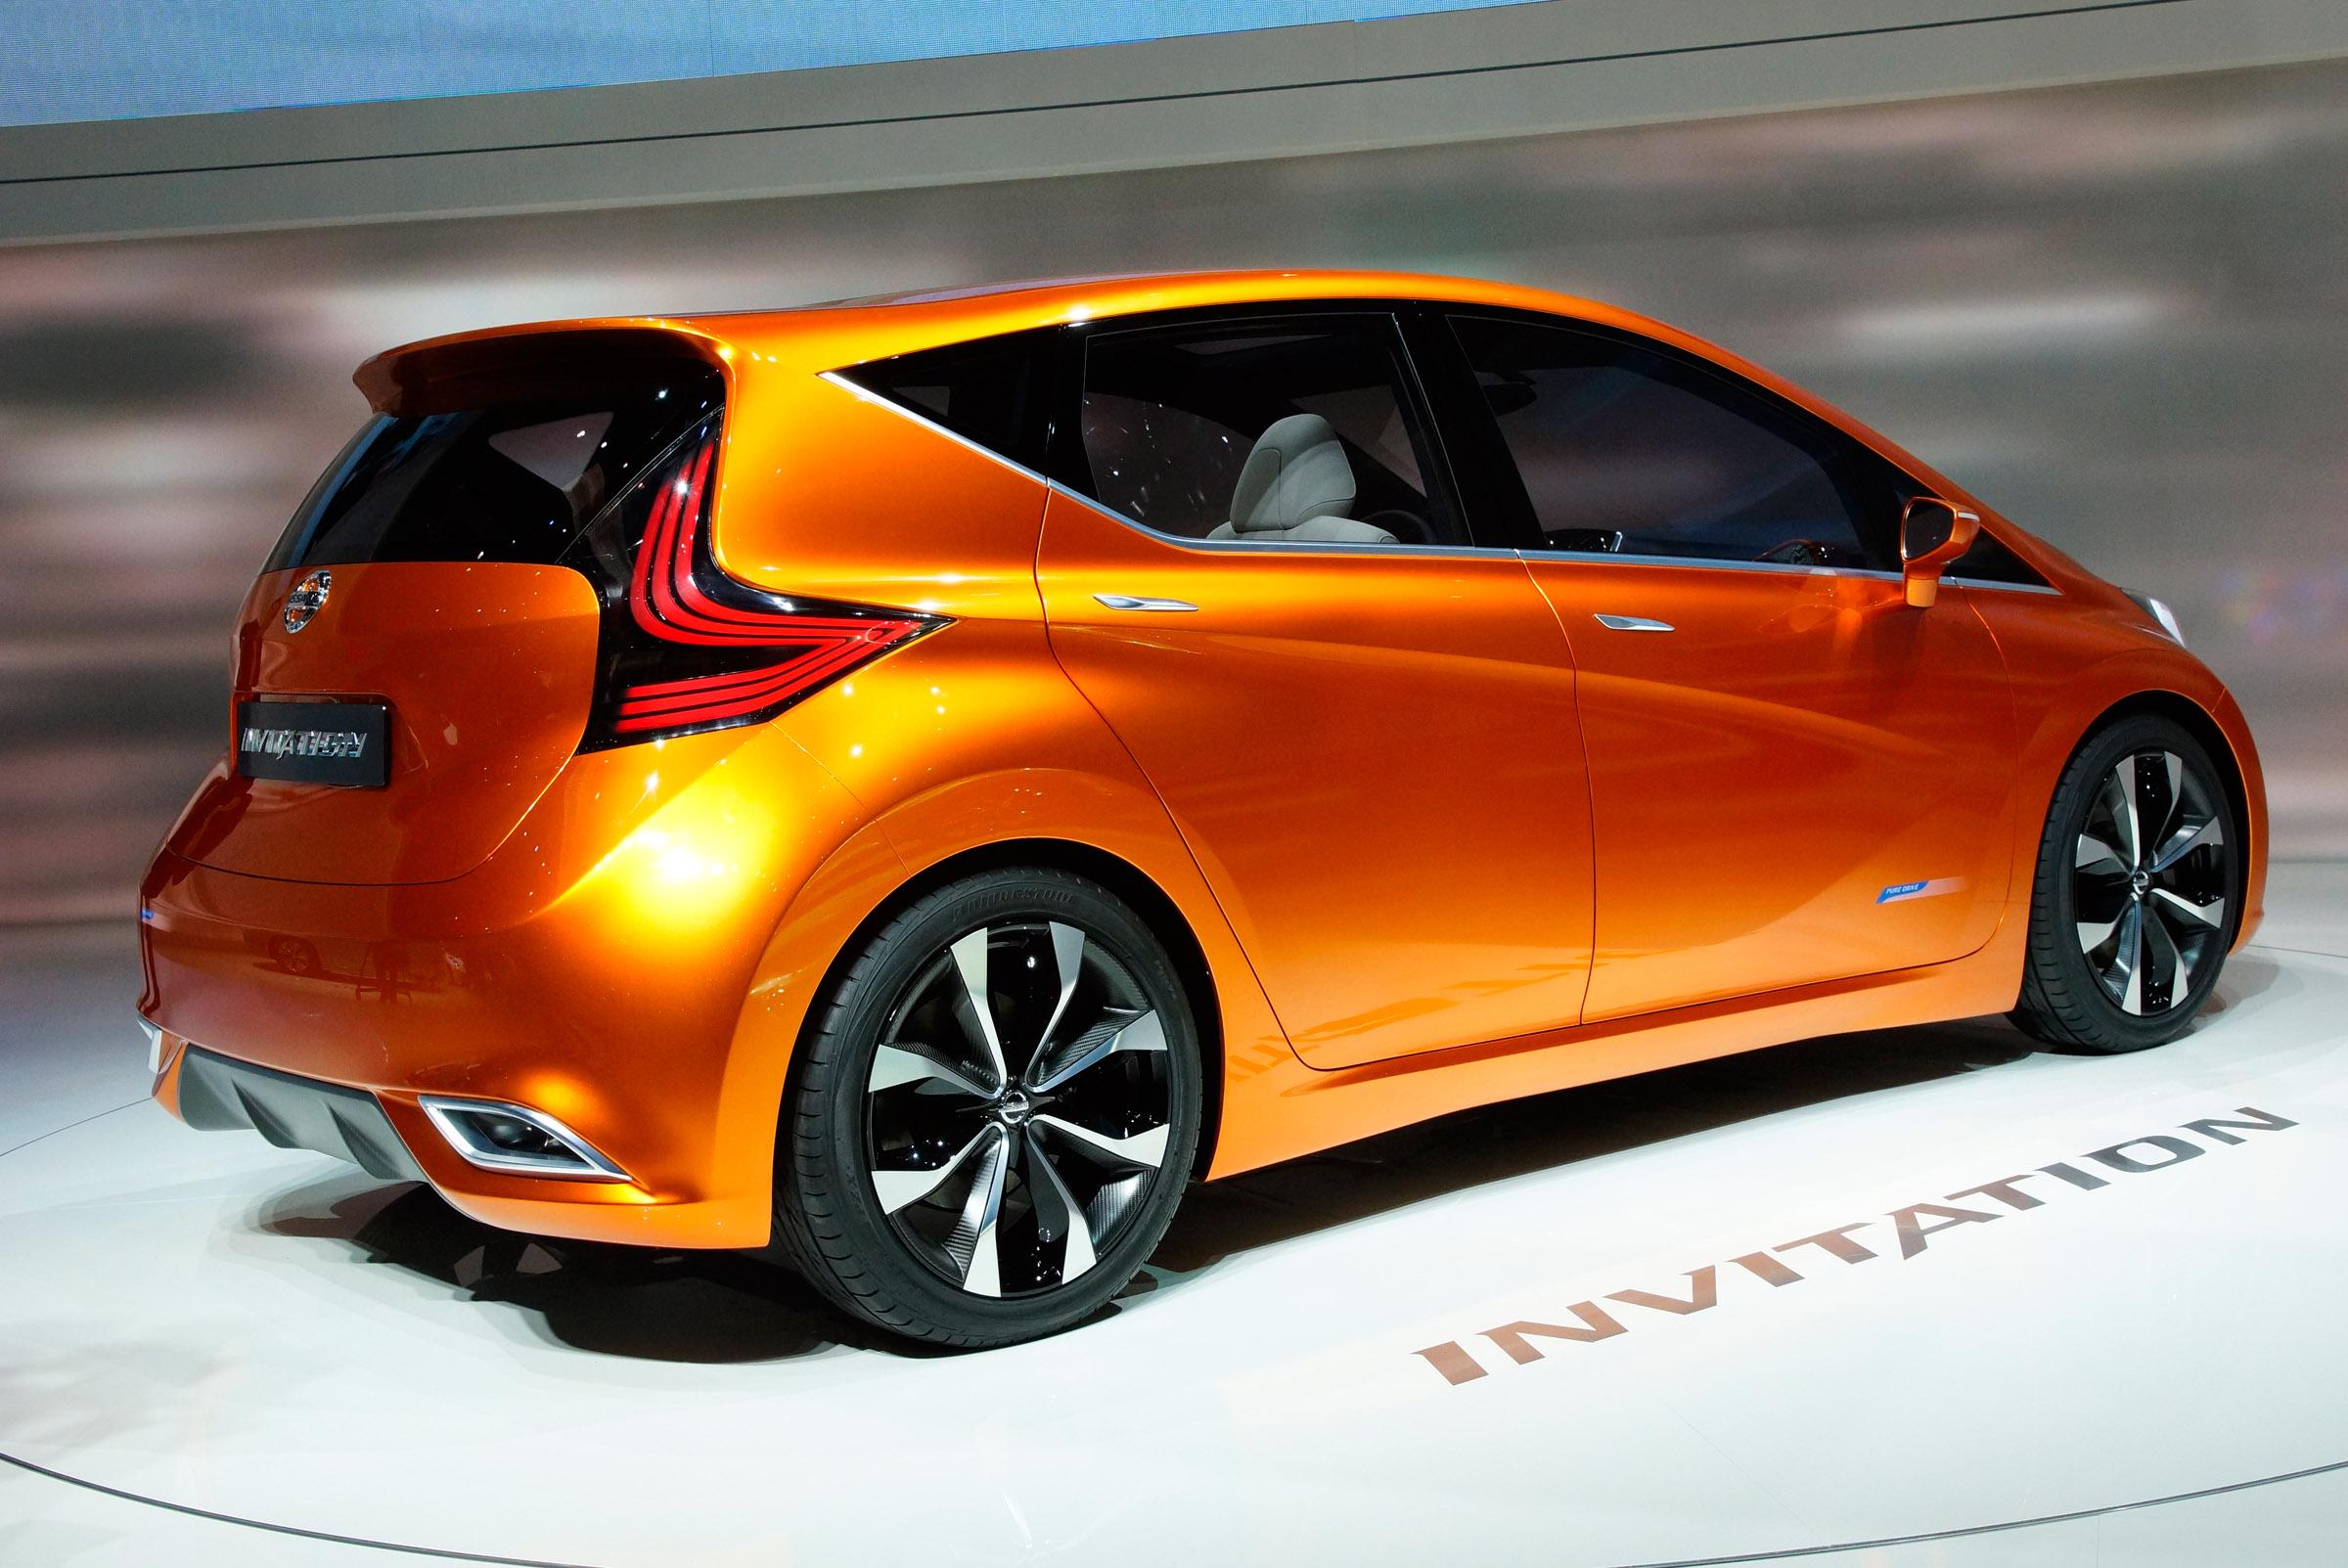 Range Rover Evoque Review >> 2012 Geneva Motor Show: Nissan Invitation Concept